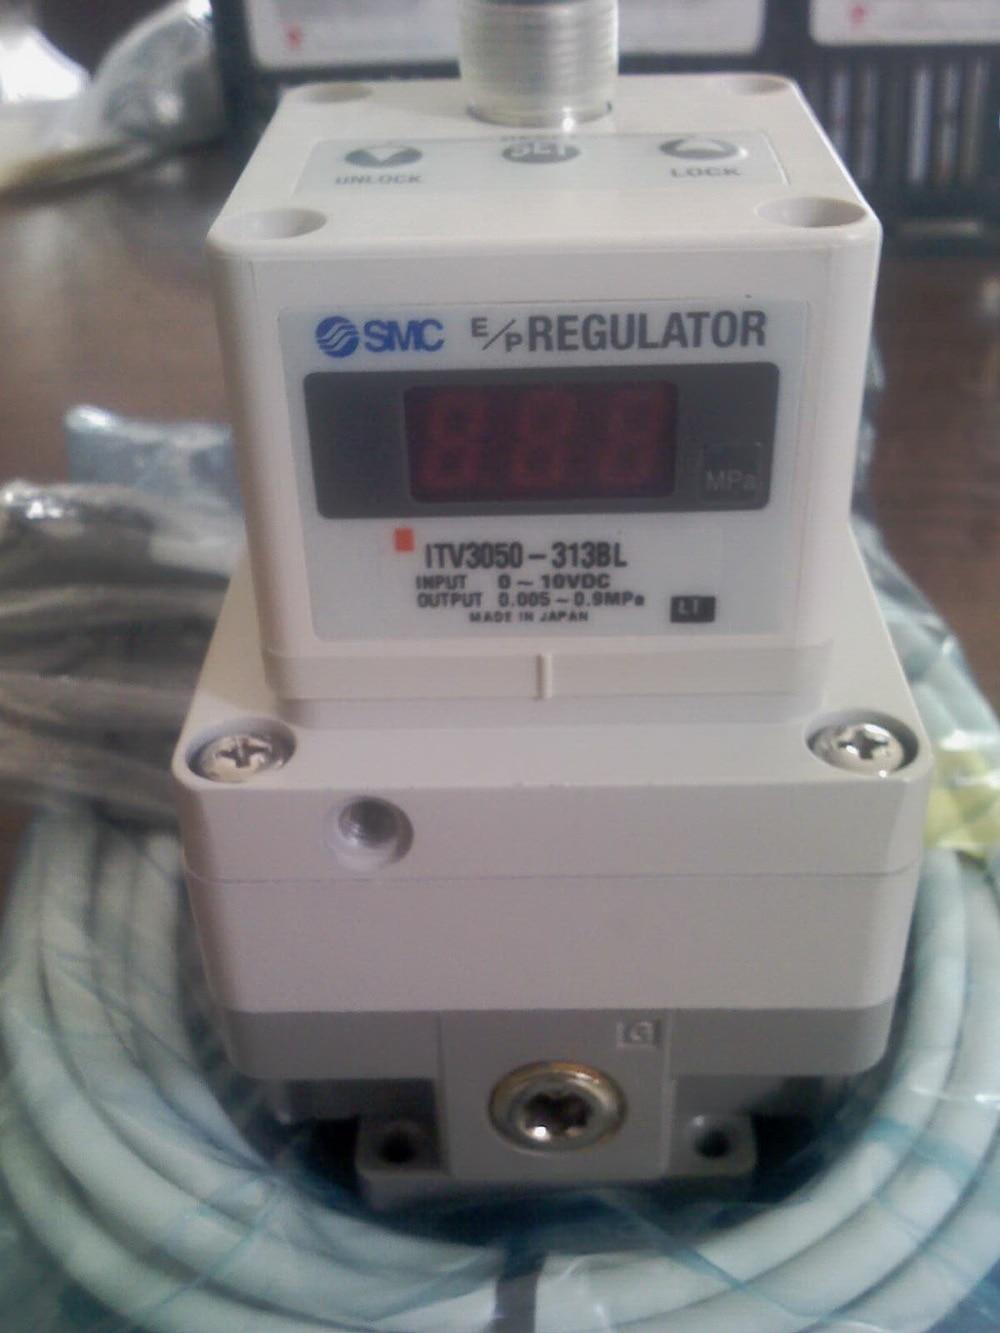 ITV3050-314N ITV3050-314L ELECTRO/PNEUMATIC REGULATOR, 24VDC Rc1/2 PORT NEW itv2030 312l electro pneumatic regulator 24vdc 1 4 port 0 10v input